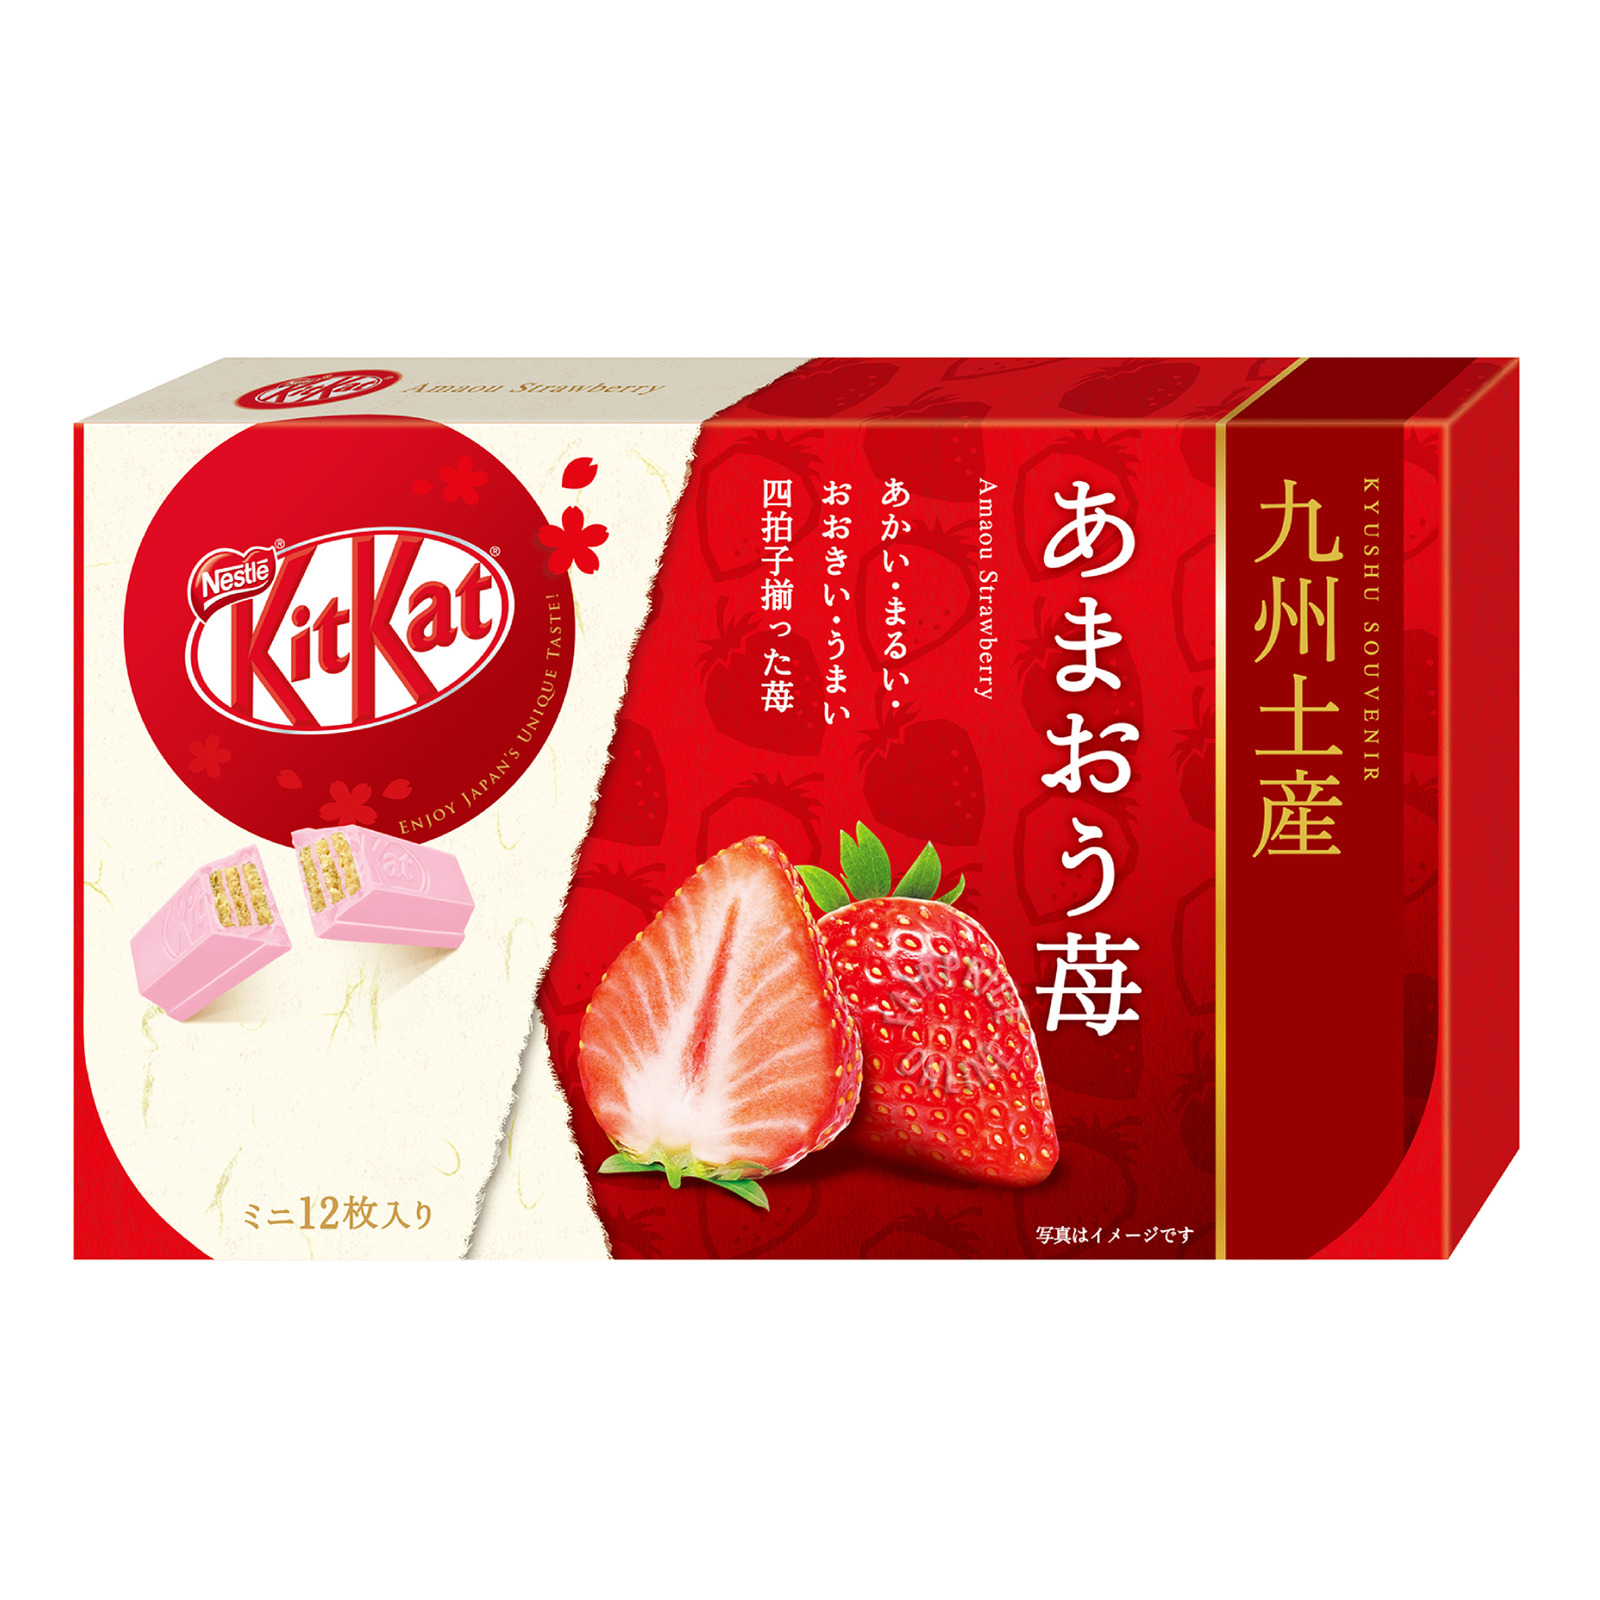 Nestle Kit Kat Mini Chocolate Bars - Strawberry